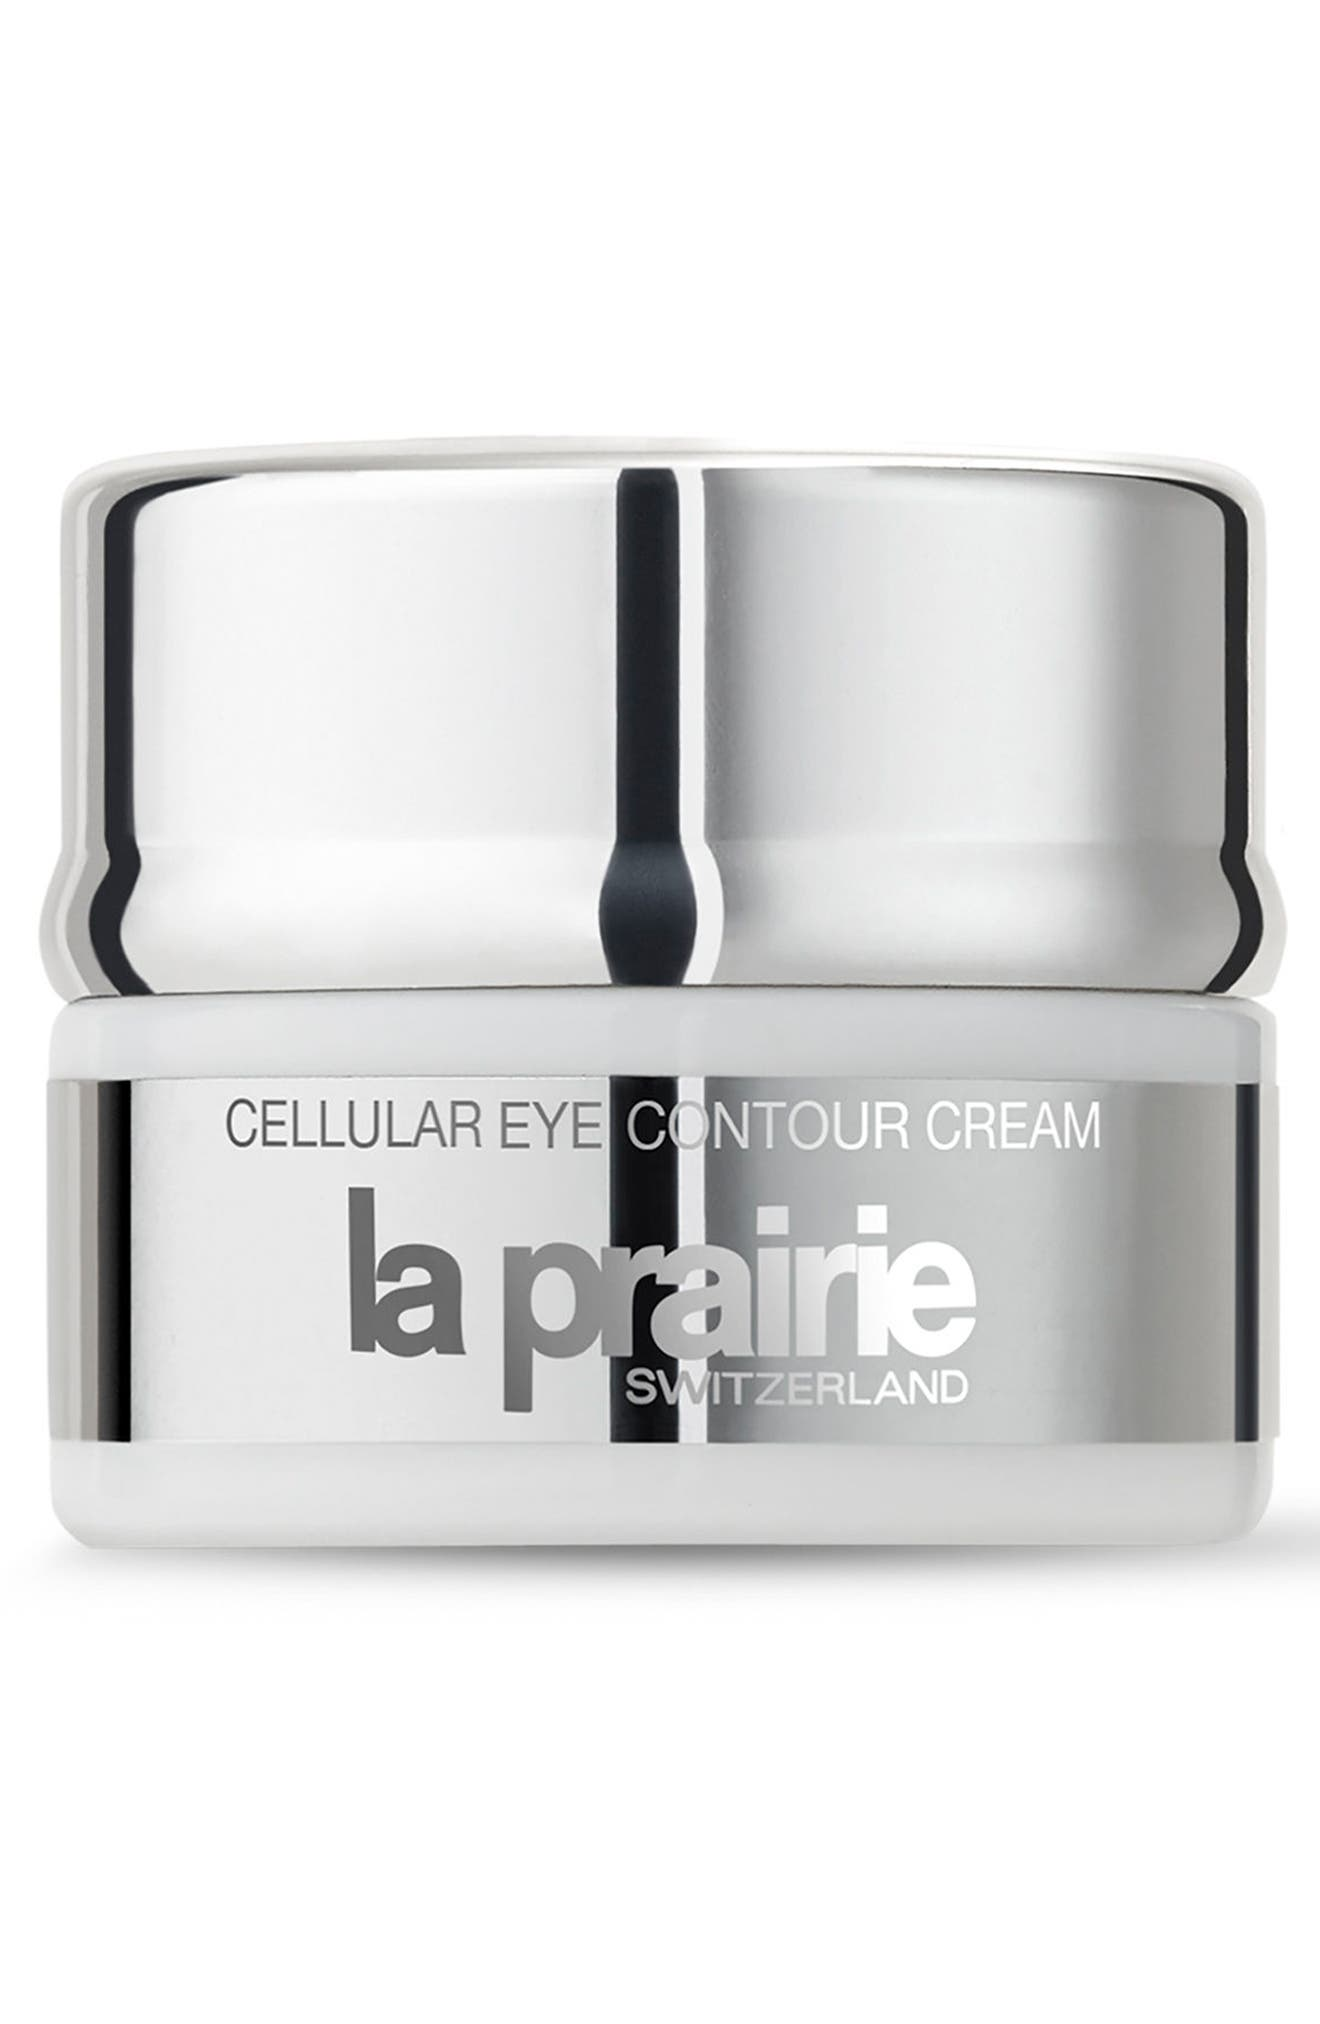 LA PRAIRIE, Cellular Eye Contour Cream, Main thumbnail 1, color, NO COLOR